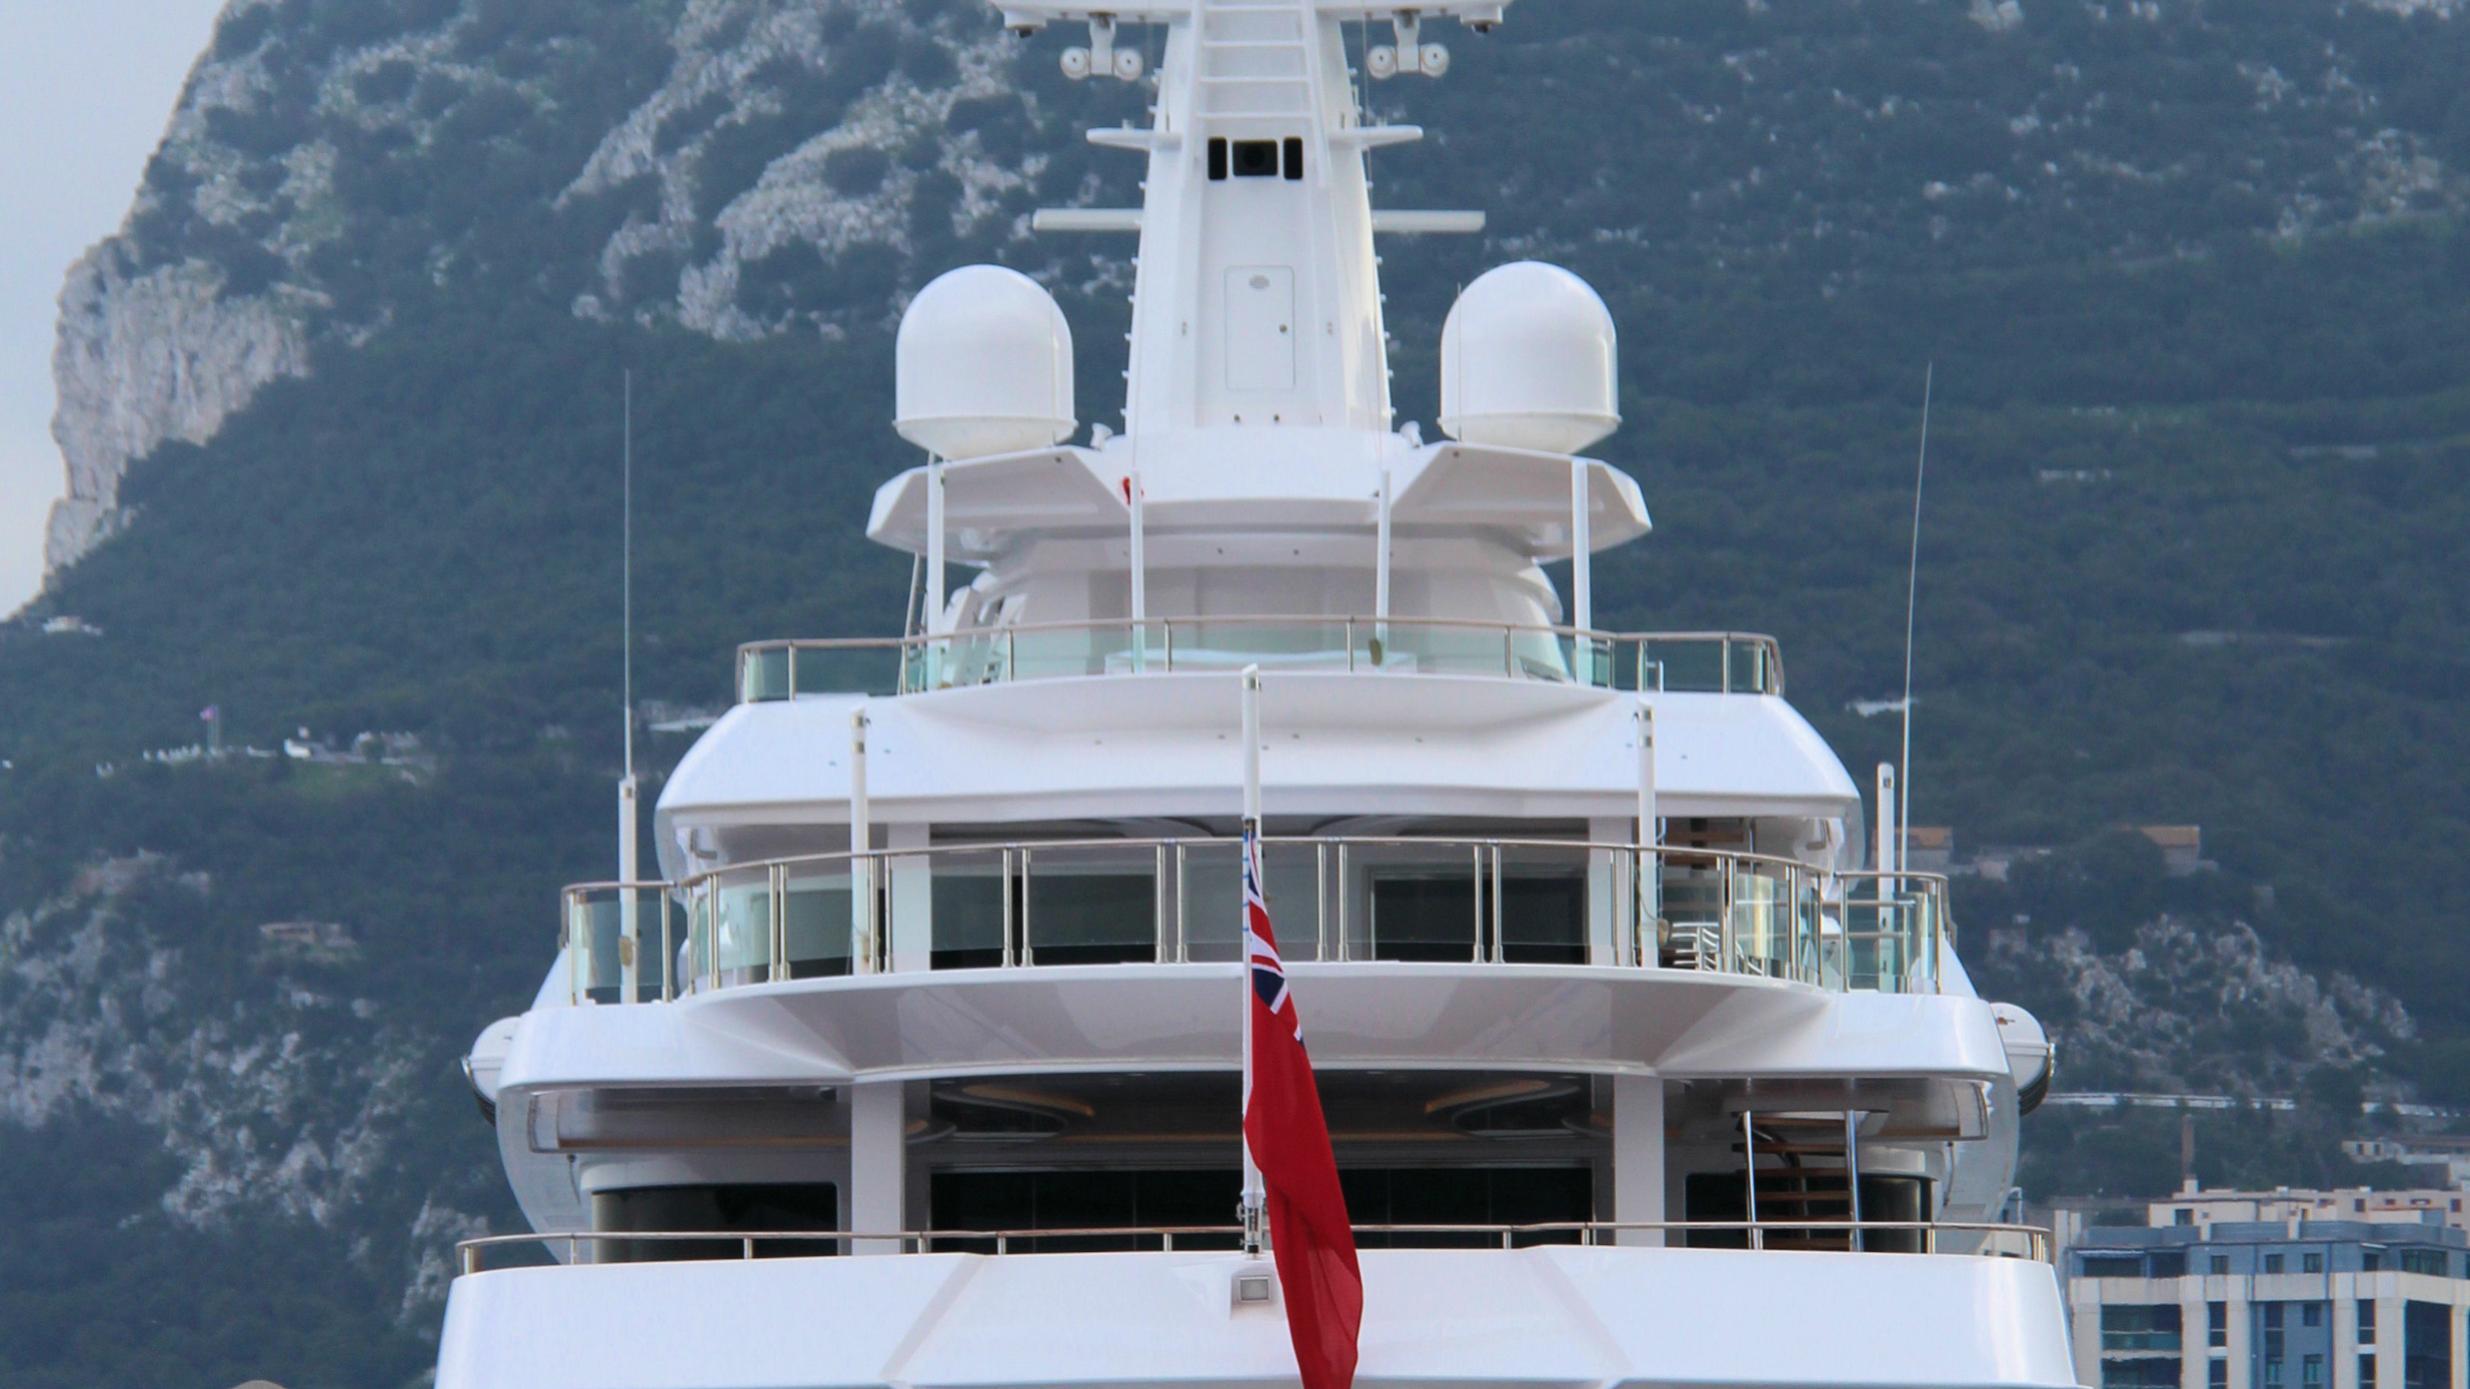 chopi-chopi-motor-yacht-crn-2013-80m-stern